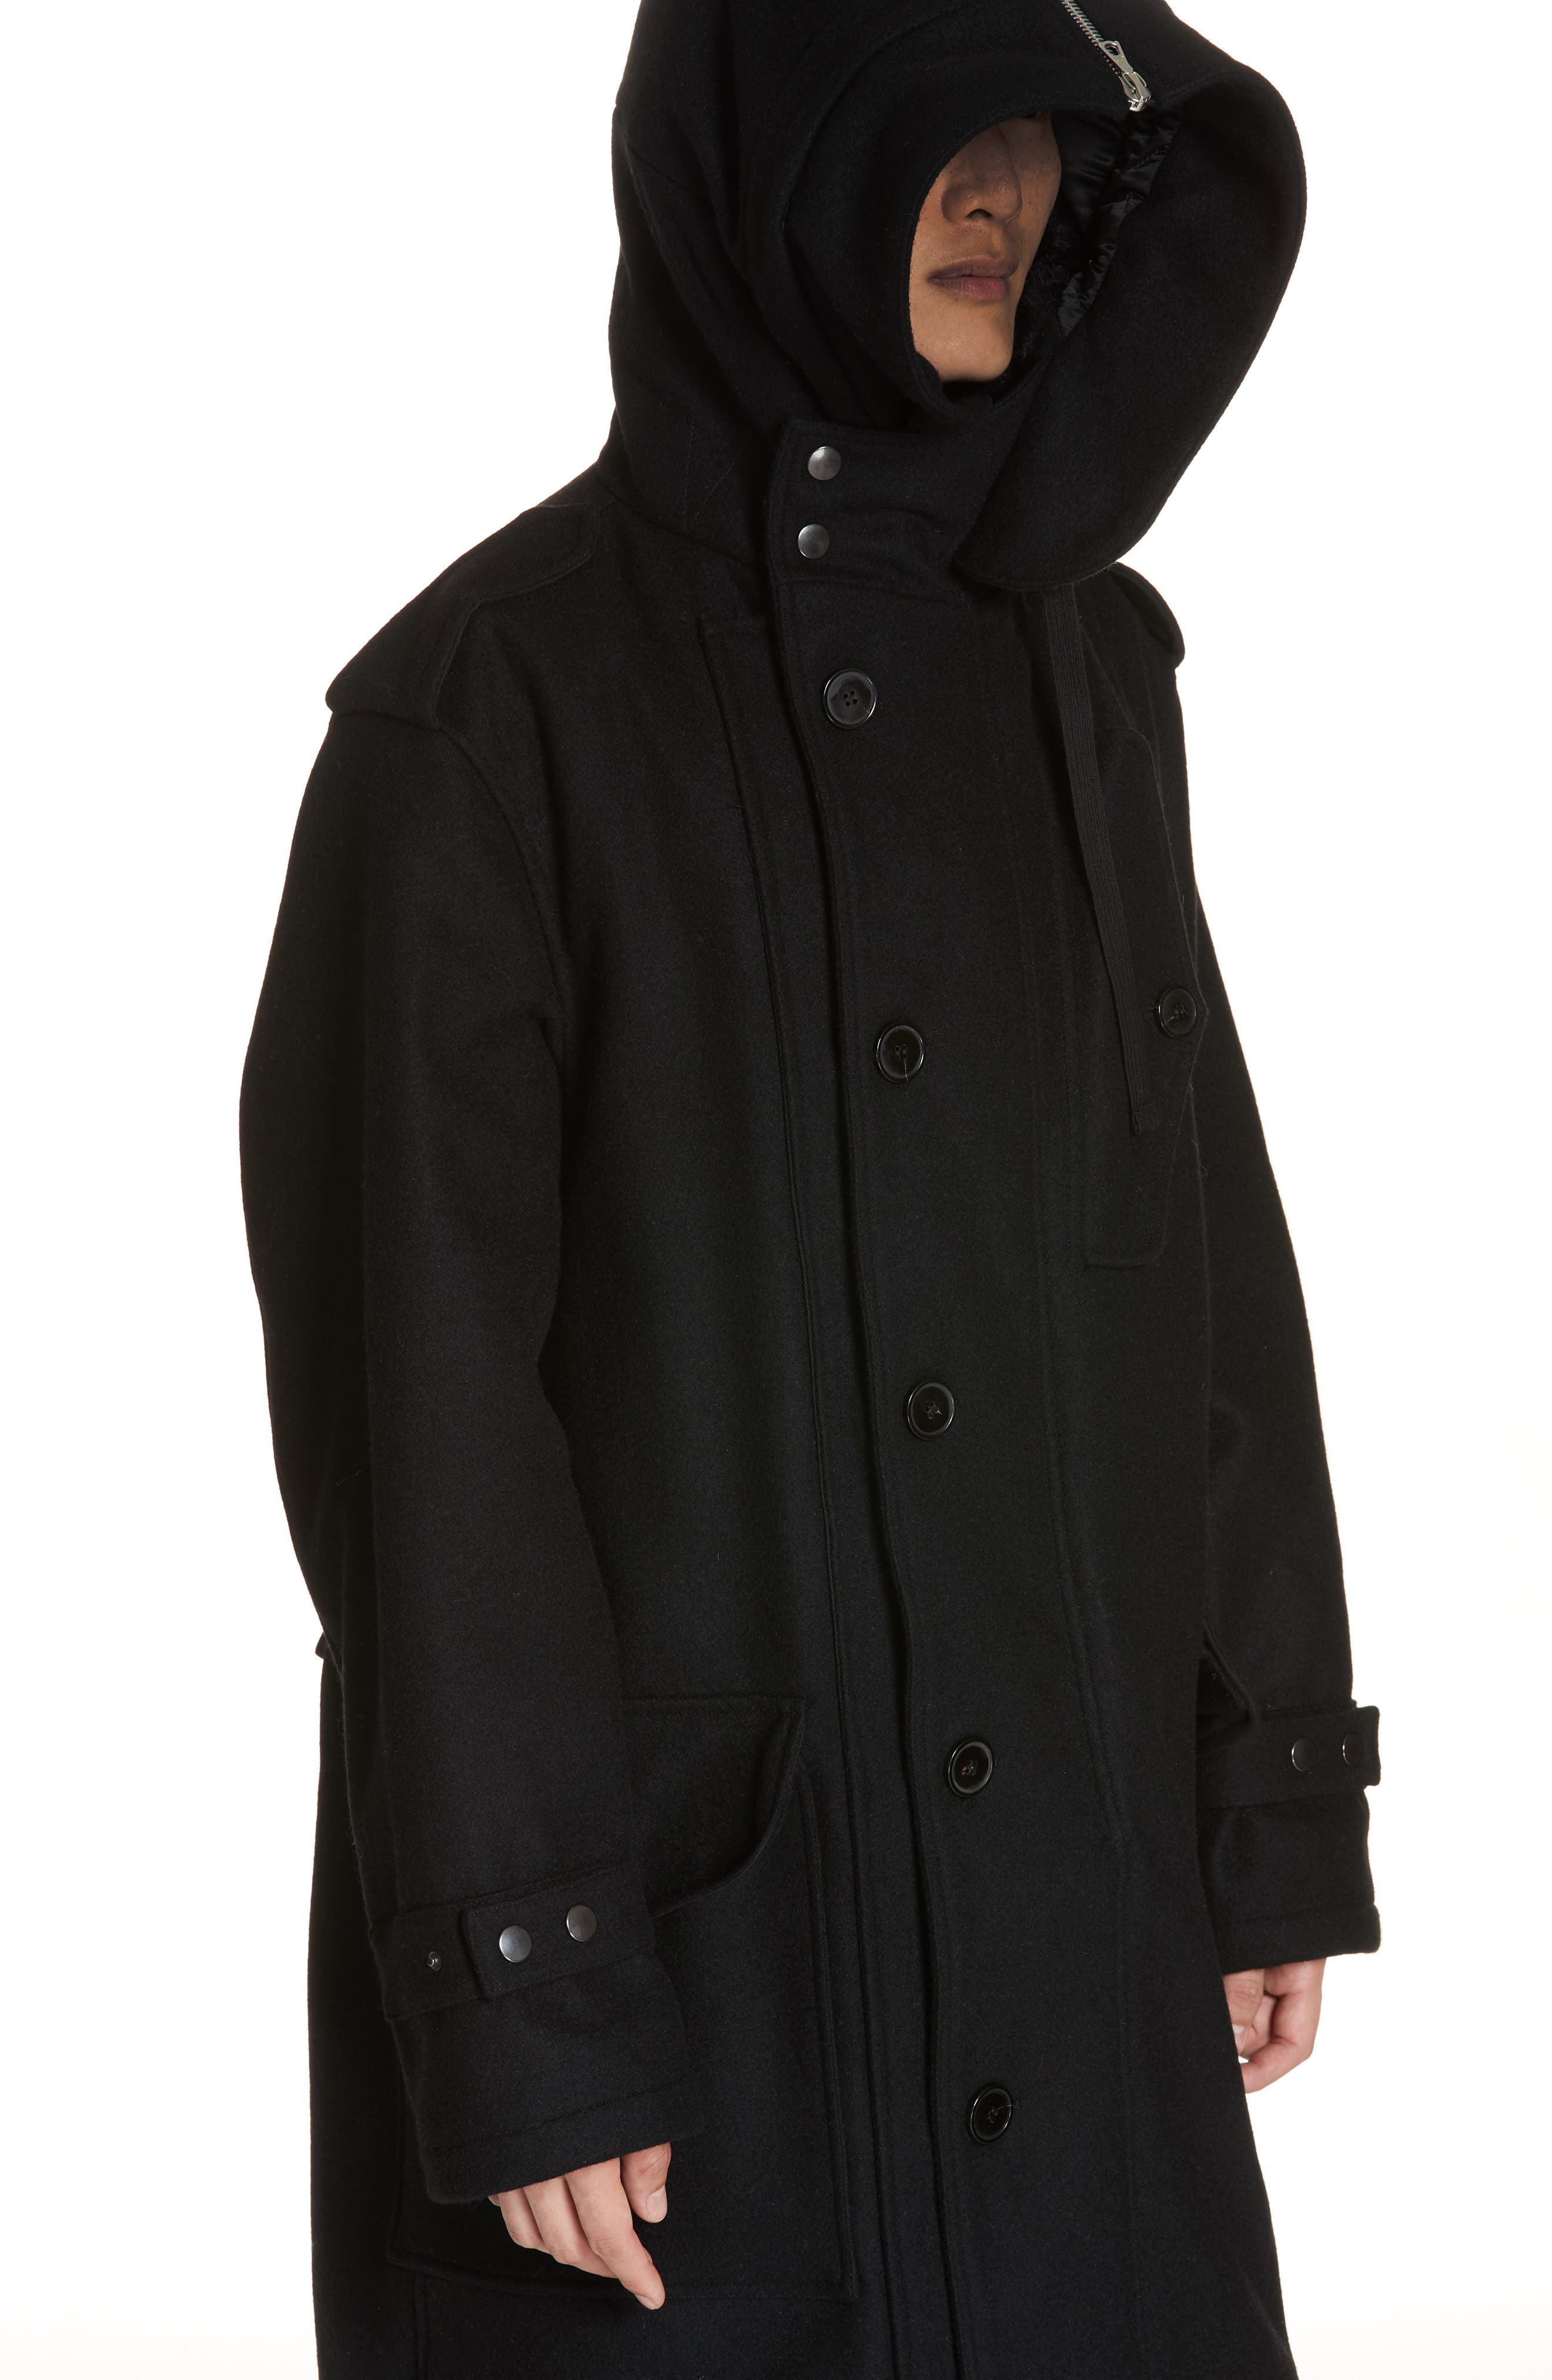 Verreli Hooded Parka with Faux Fur Trim,                             Alternate thumbnail 2, color,                             BLACK 900